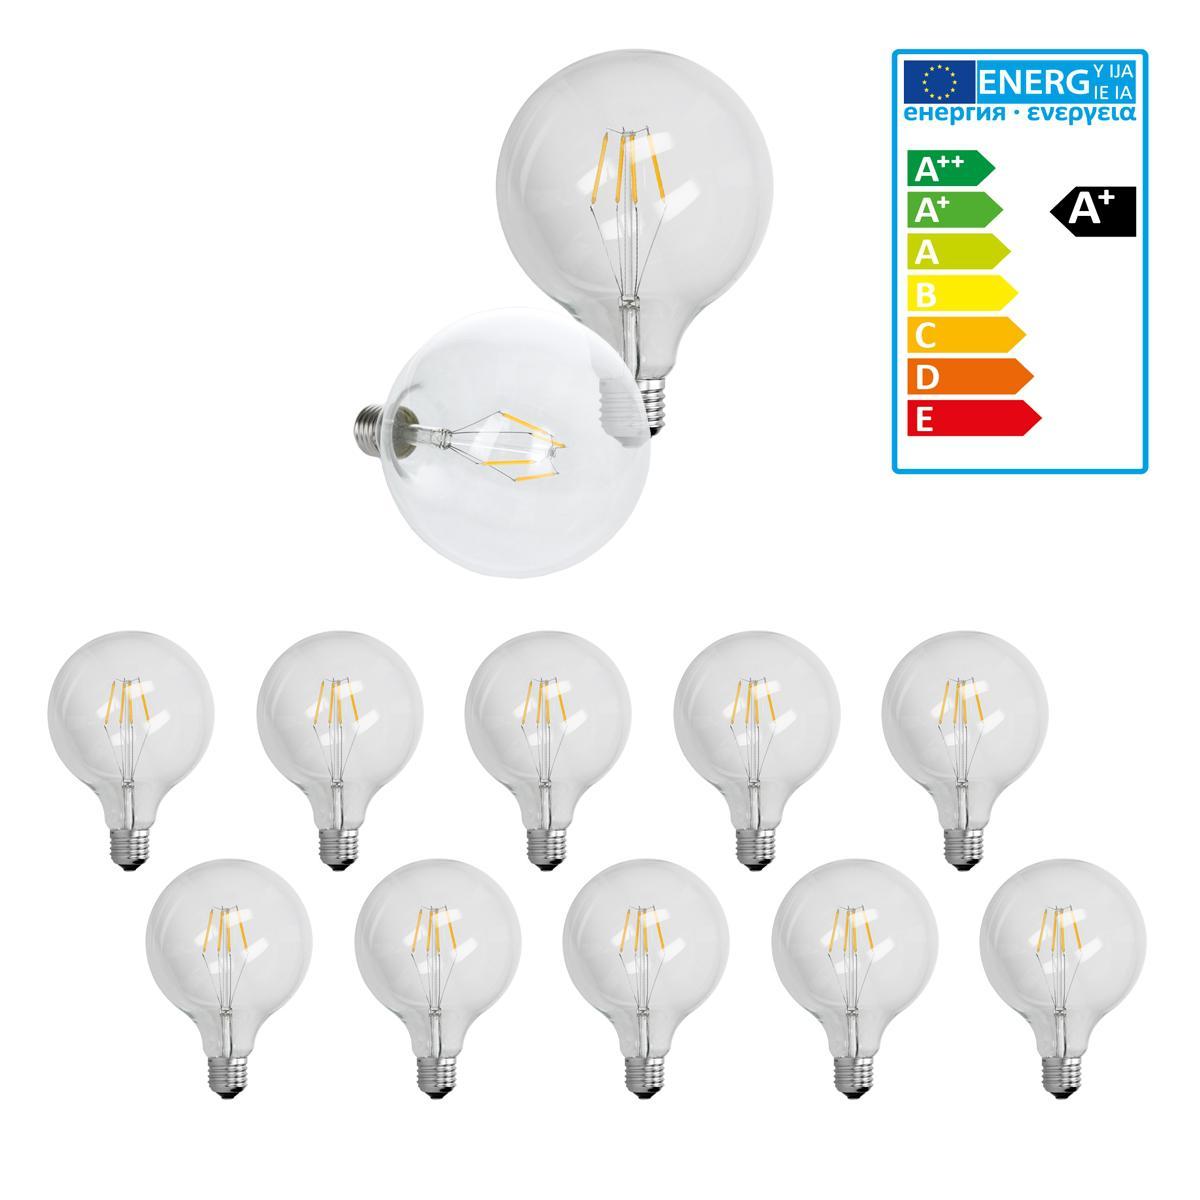 Ecd Germany 10 x ampoule LED gros filament E27 4W 125 mm blanc chaud